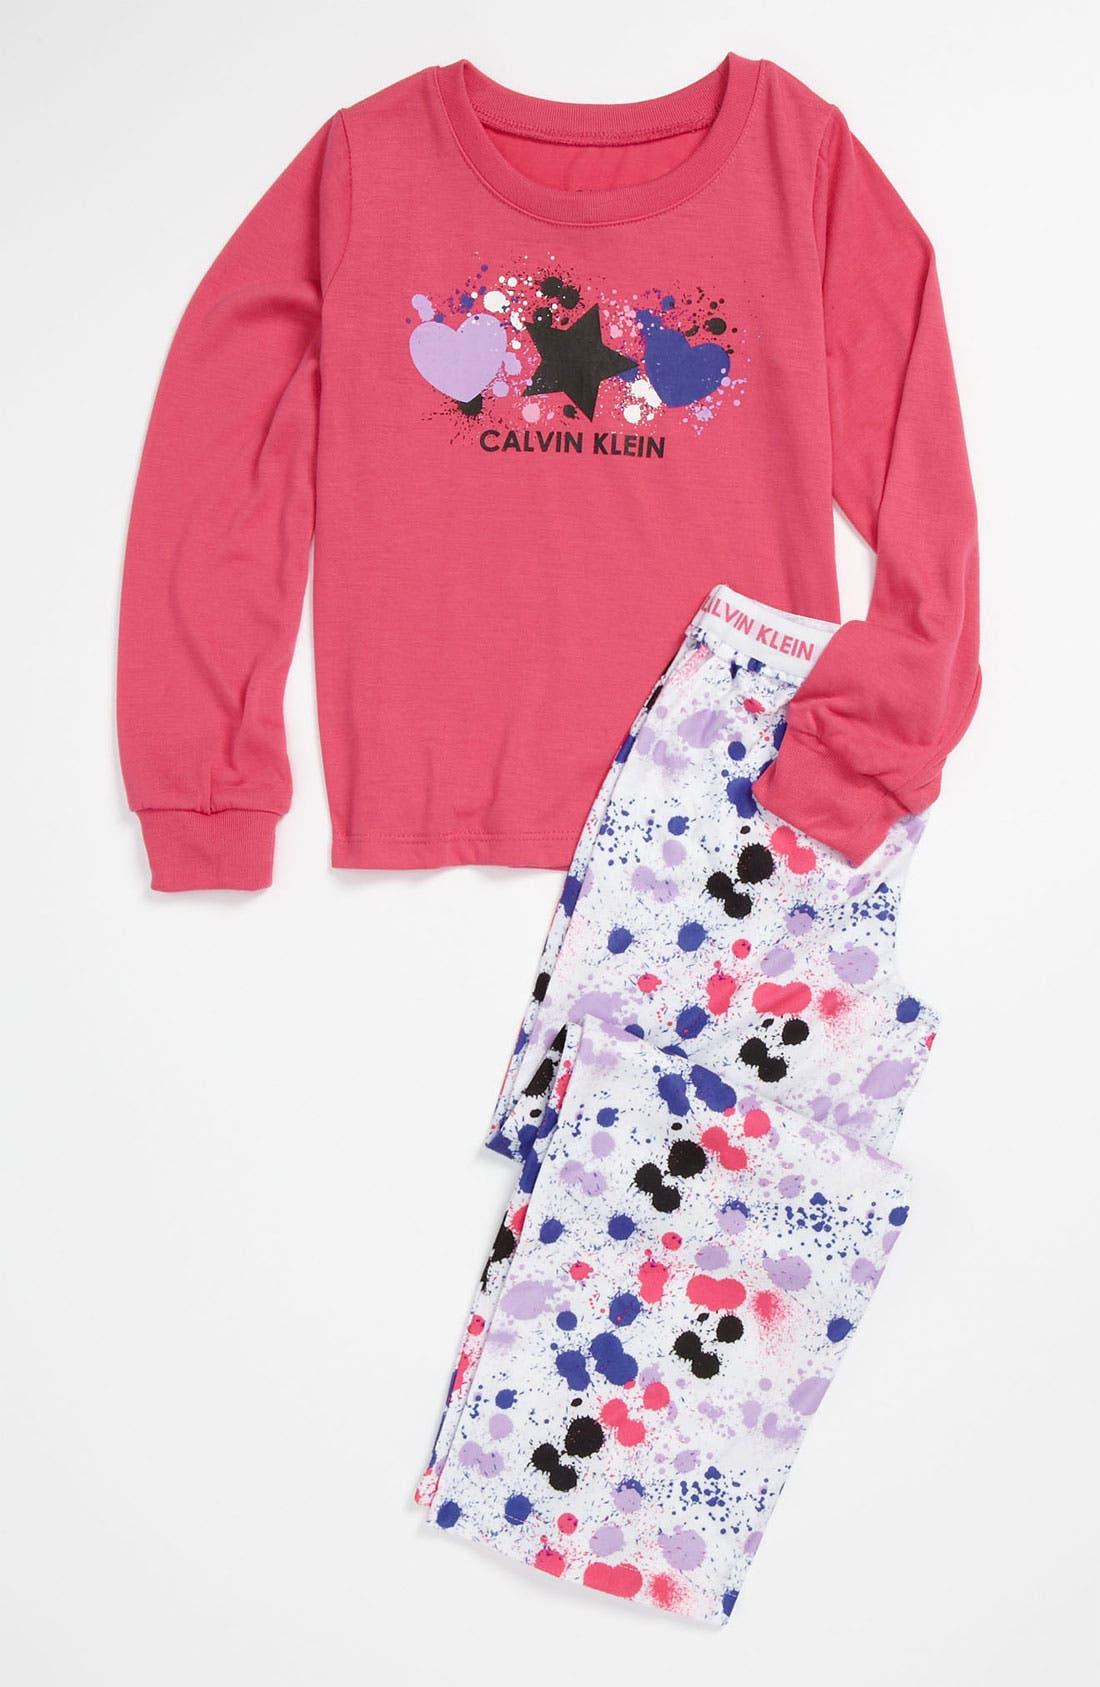 Main Image - Calvin Klein Knit Top & Pants Set (Little Girls & Big Girls)